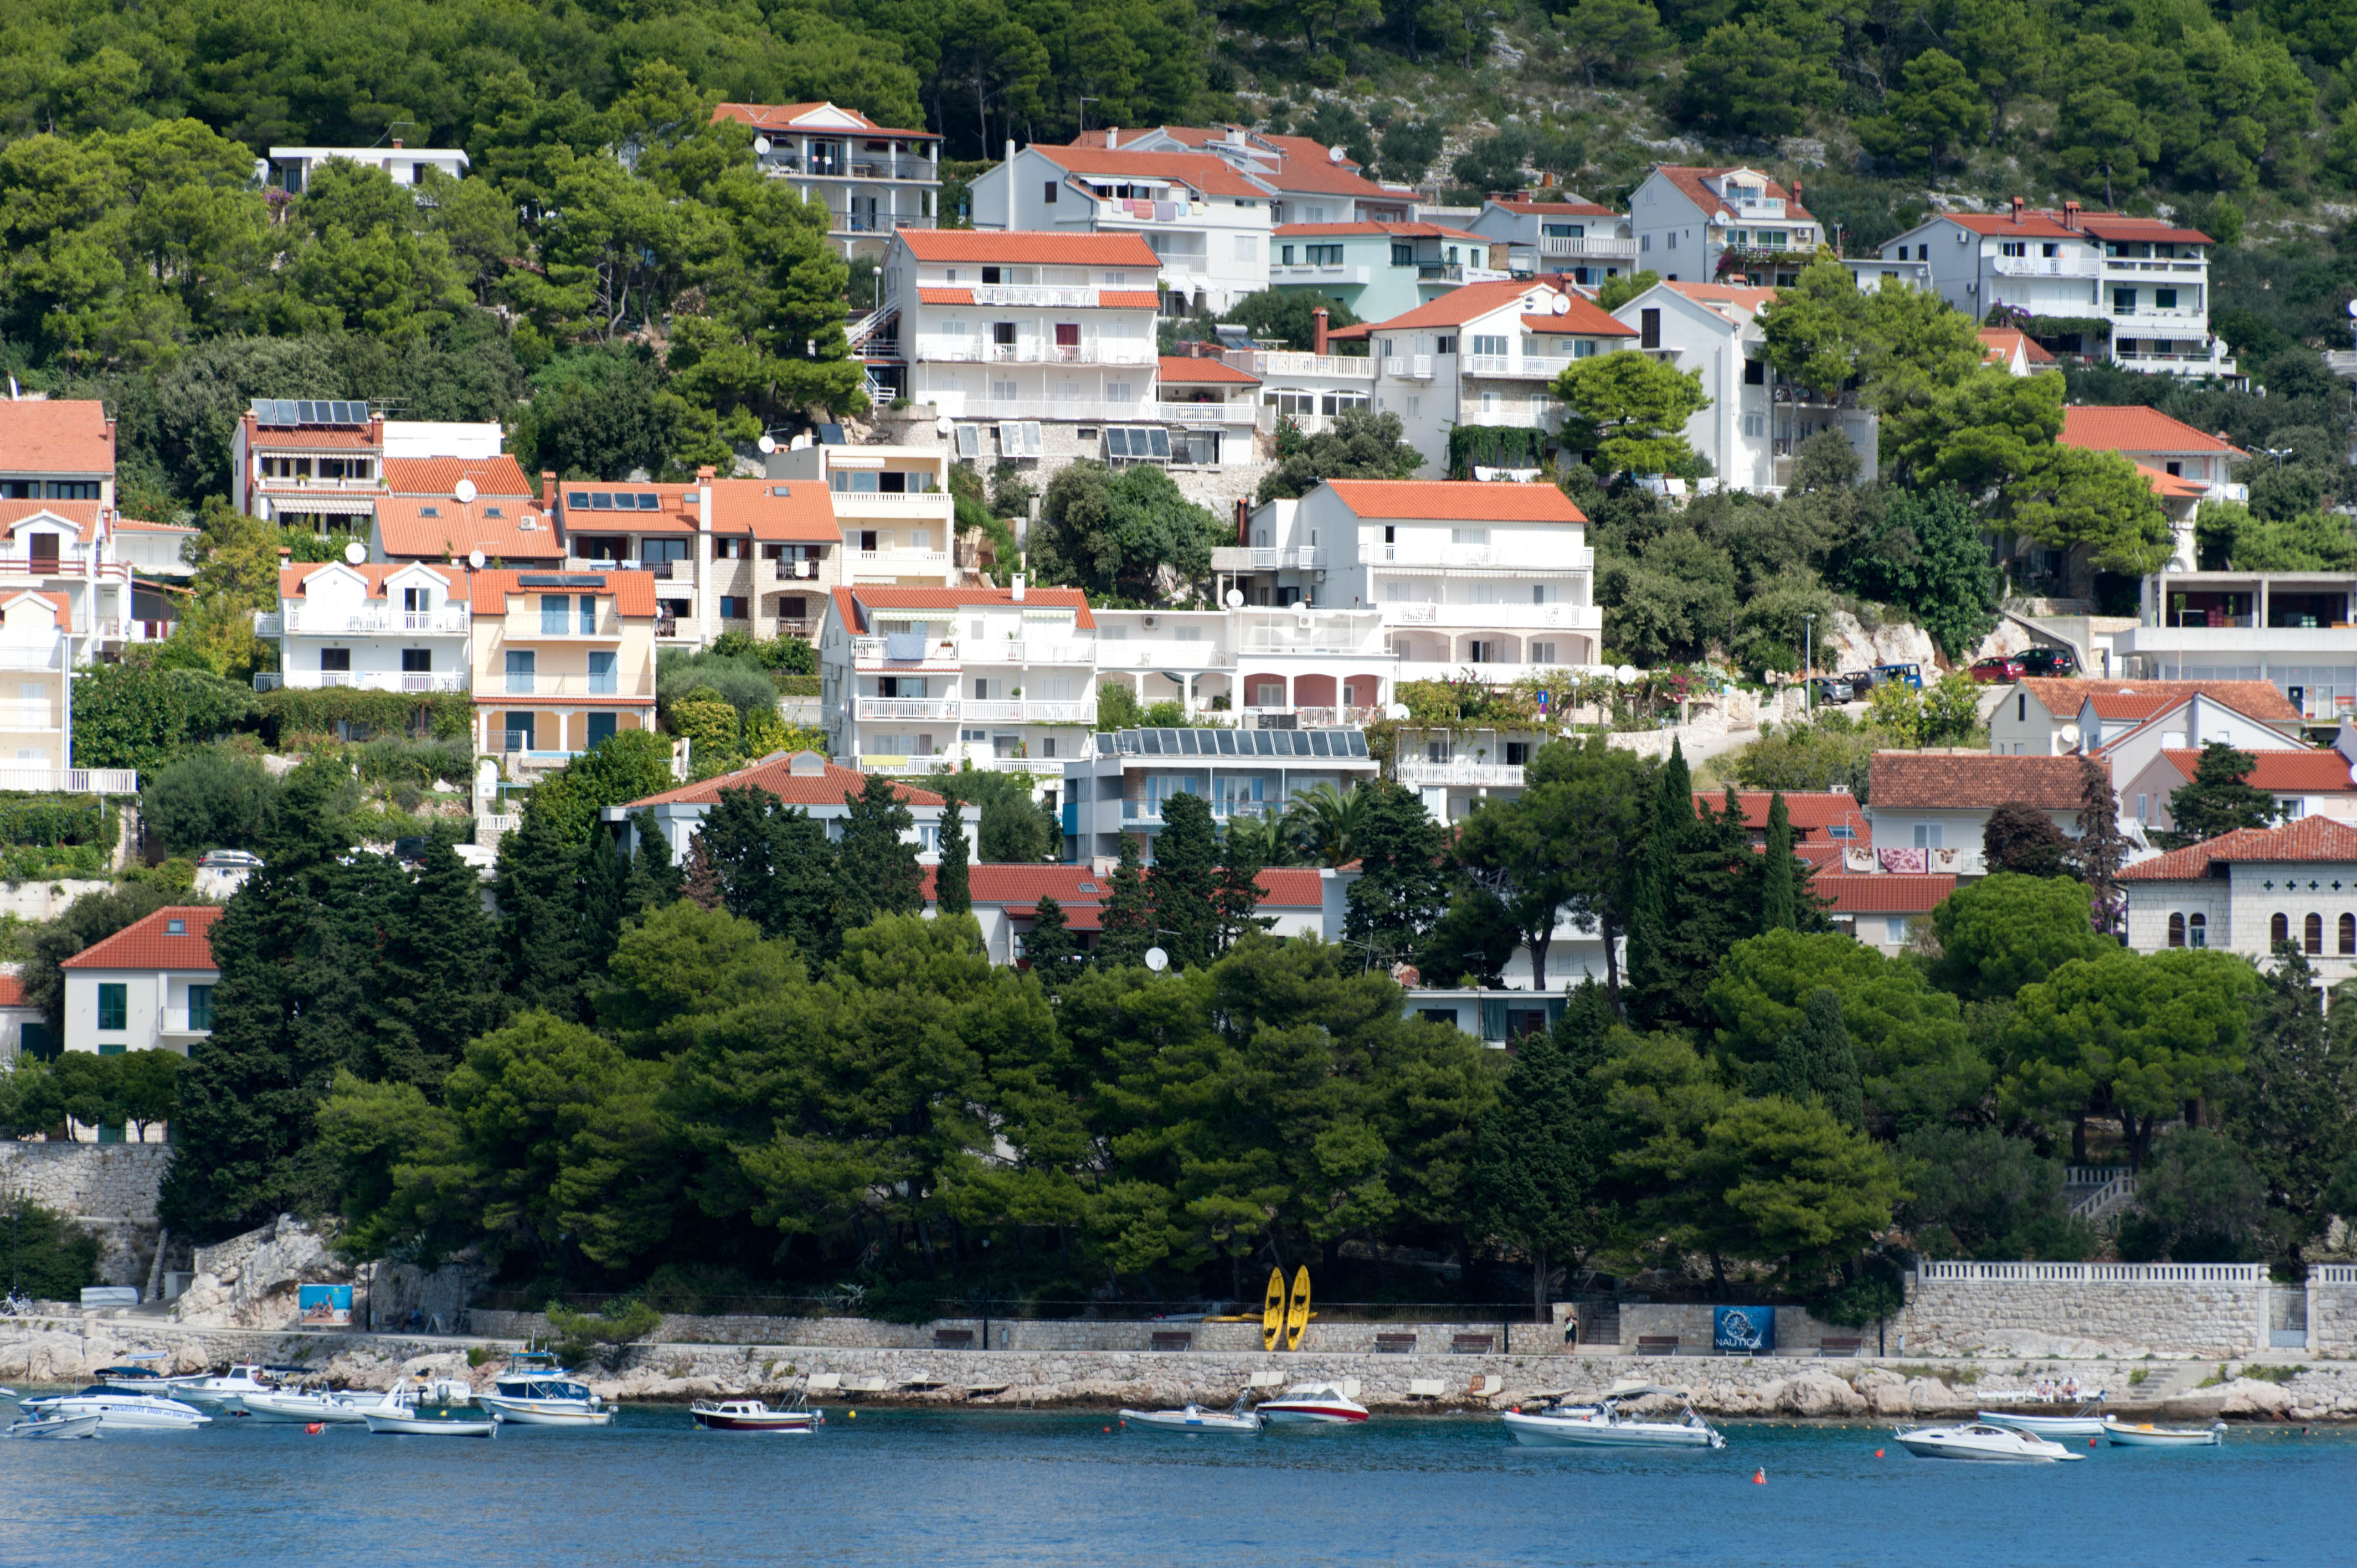 9848-Hvar (Dalmatie centrale)